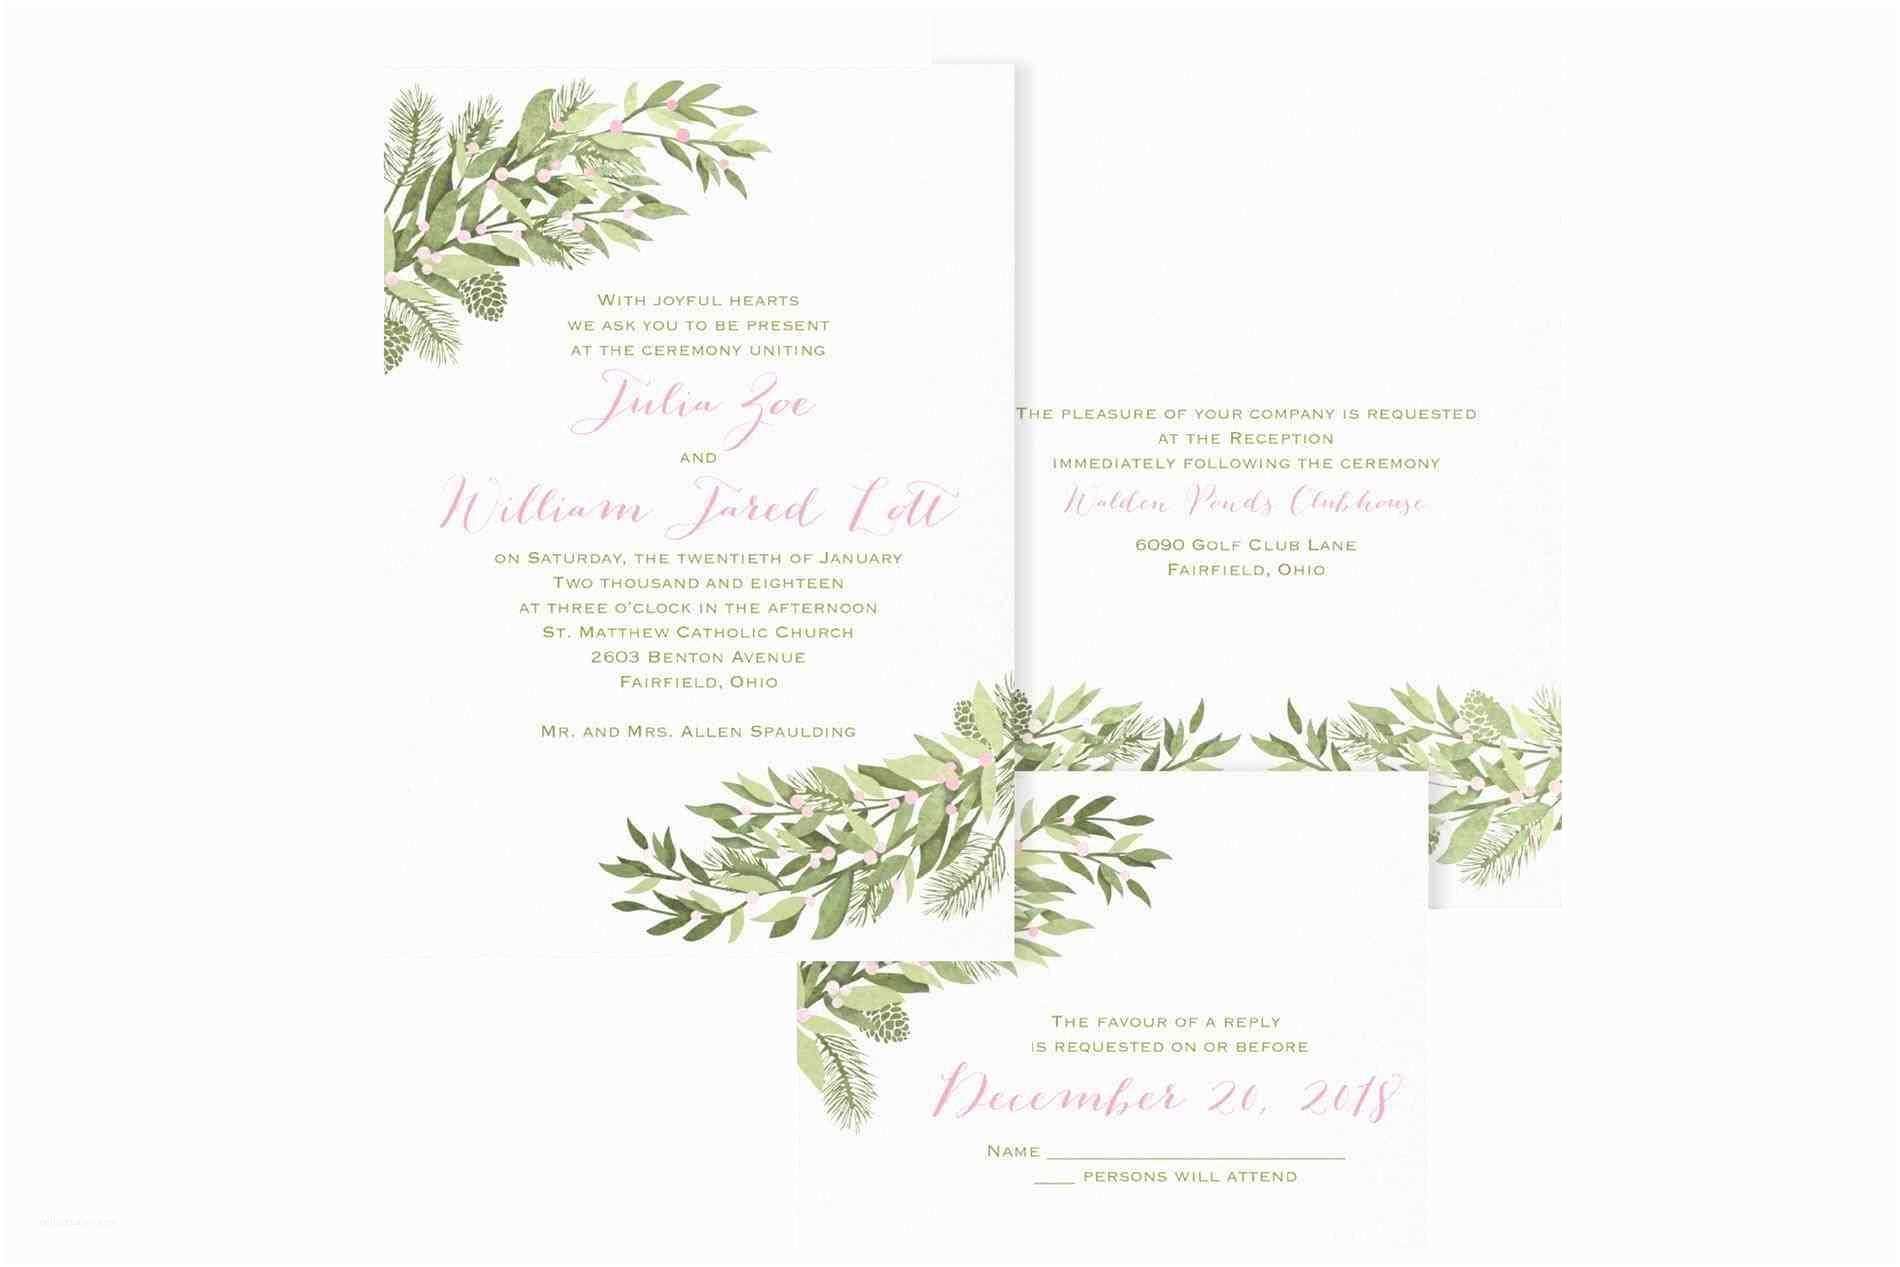 Wedding Invitation Images Unique Winter Wedding Invitations